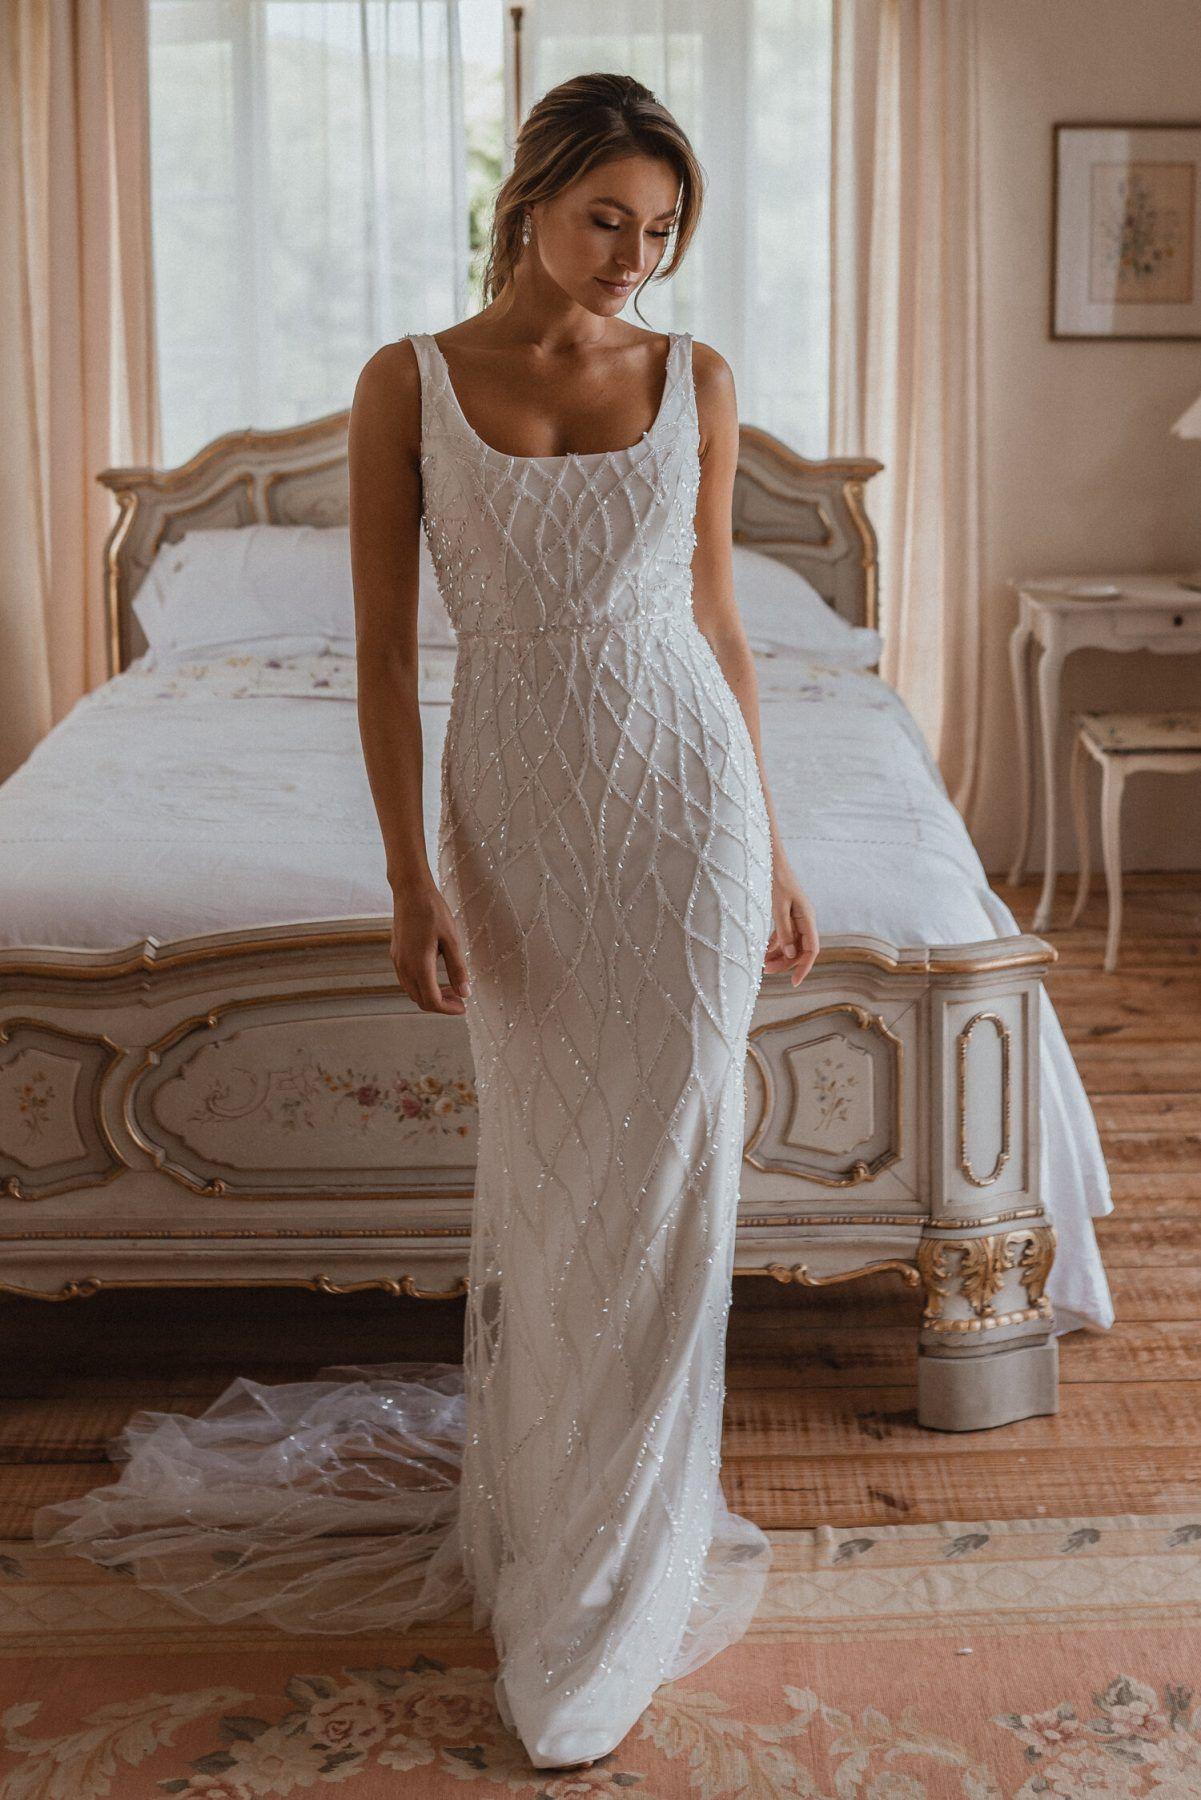 https://www.kleinfeldbridal.com/wp-content/uploads/2021/04/anna-campbell-sleeveless-square-neckline-sheath-wedding-dress-with-beading-throughout-34358762-1201x1800.jpg